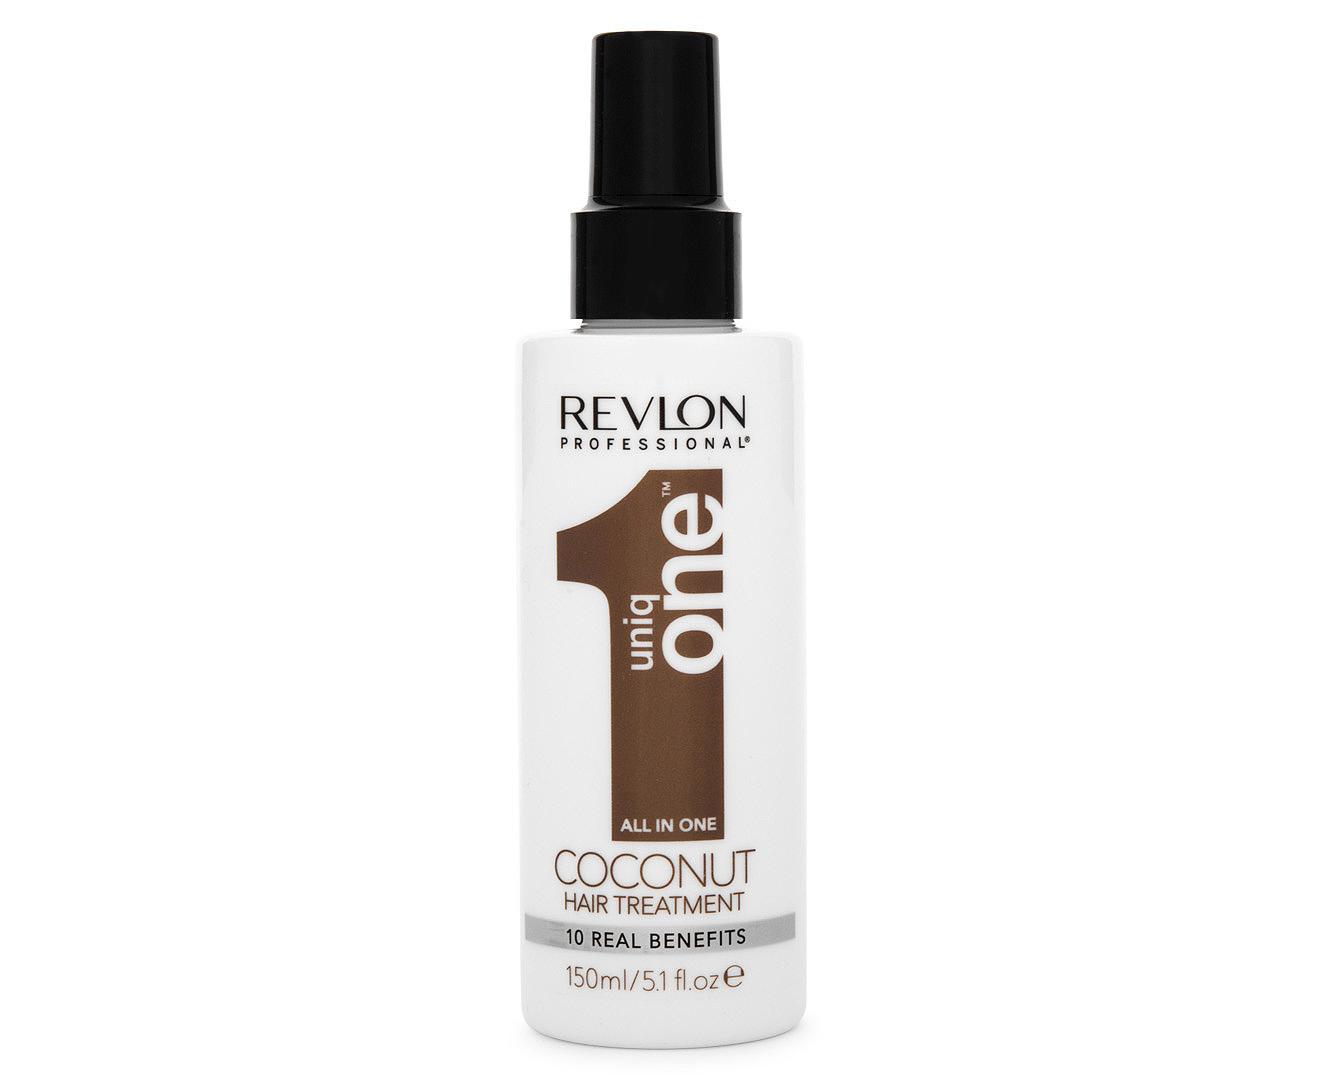 revlon professional uniq one coconut hair treatment 150ml. Black Bedroom Furniture Sets. Home Design Ideas